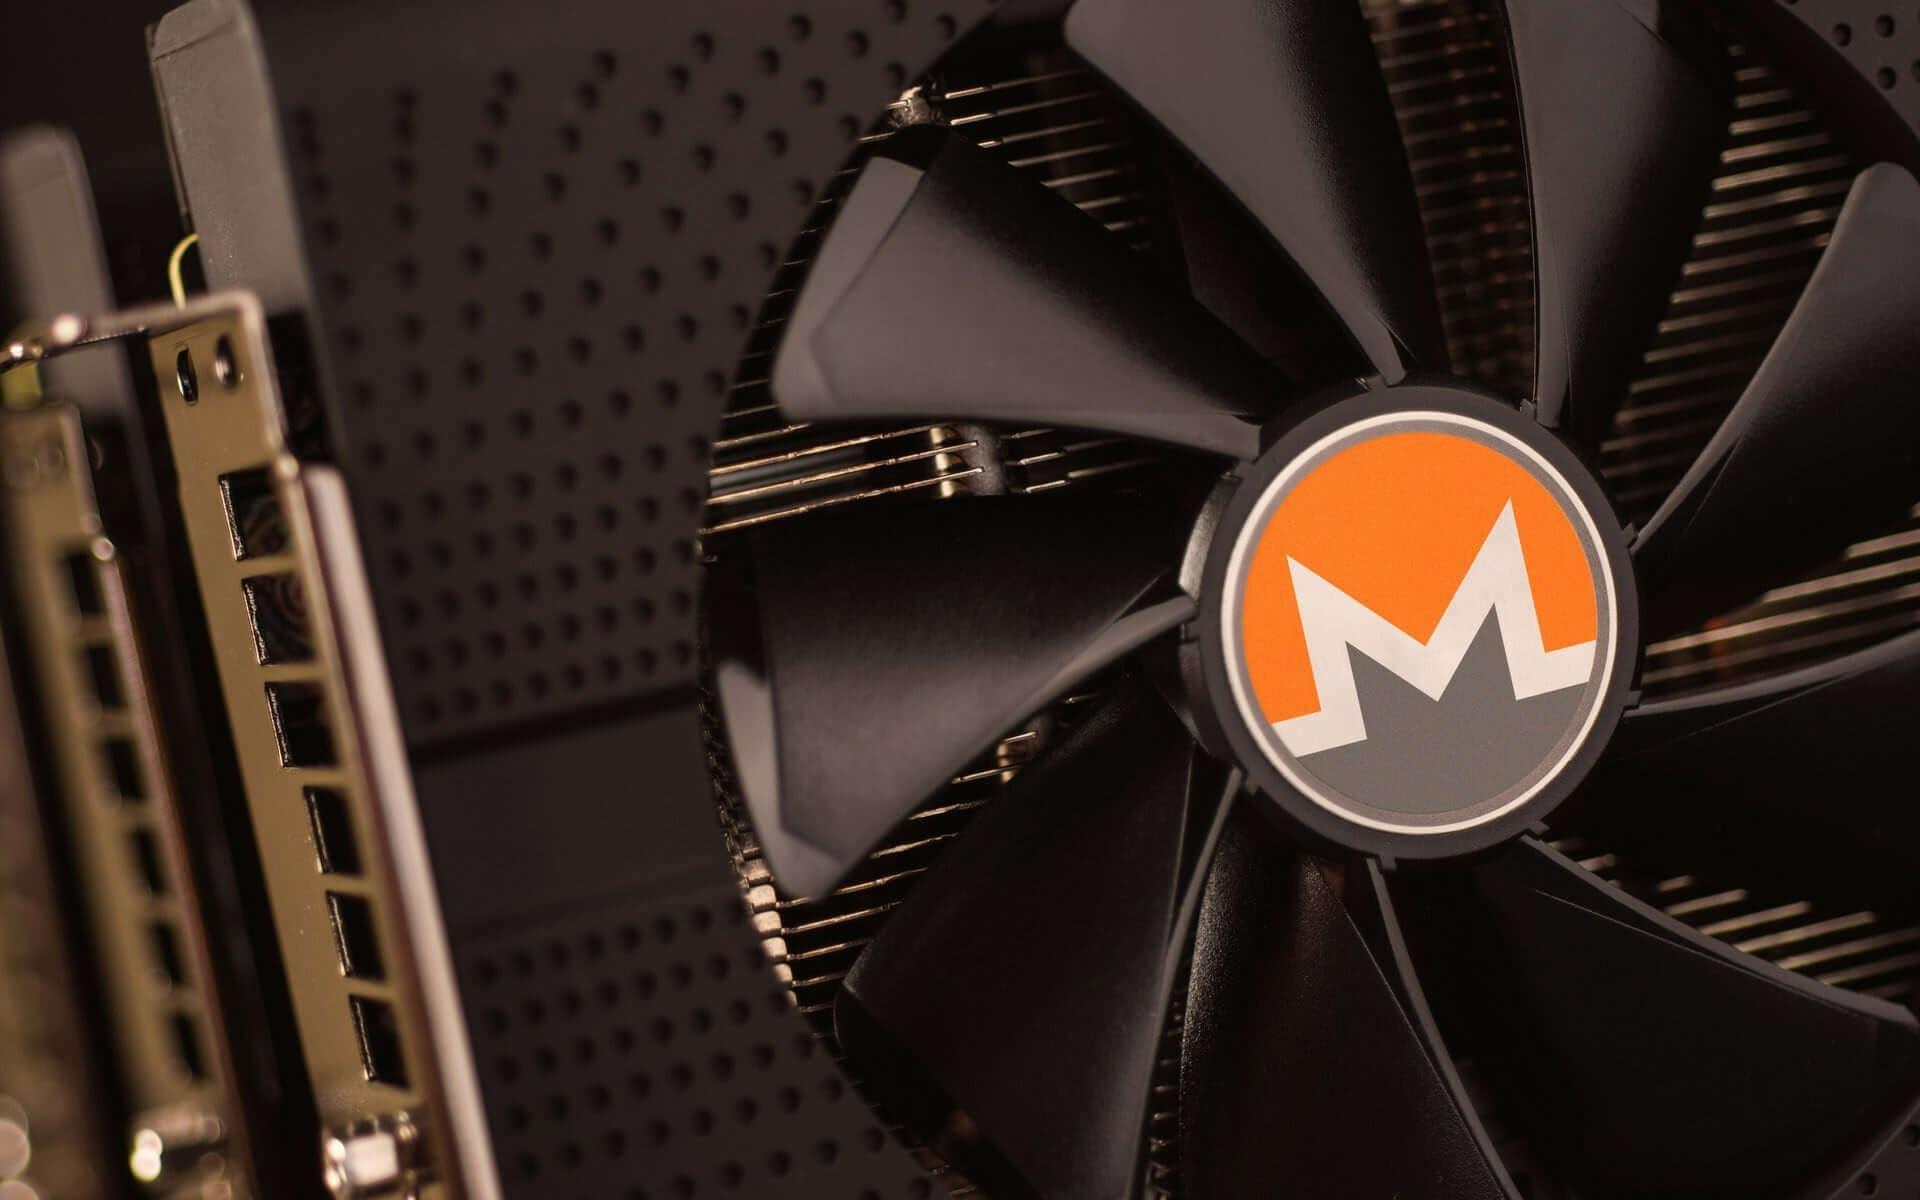 Cryptographic money mining malware